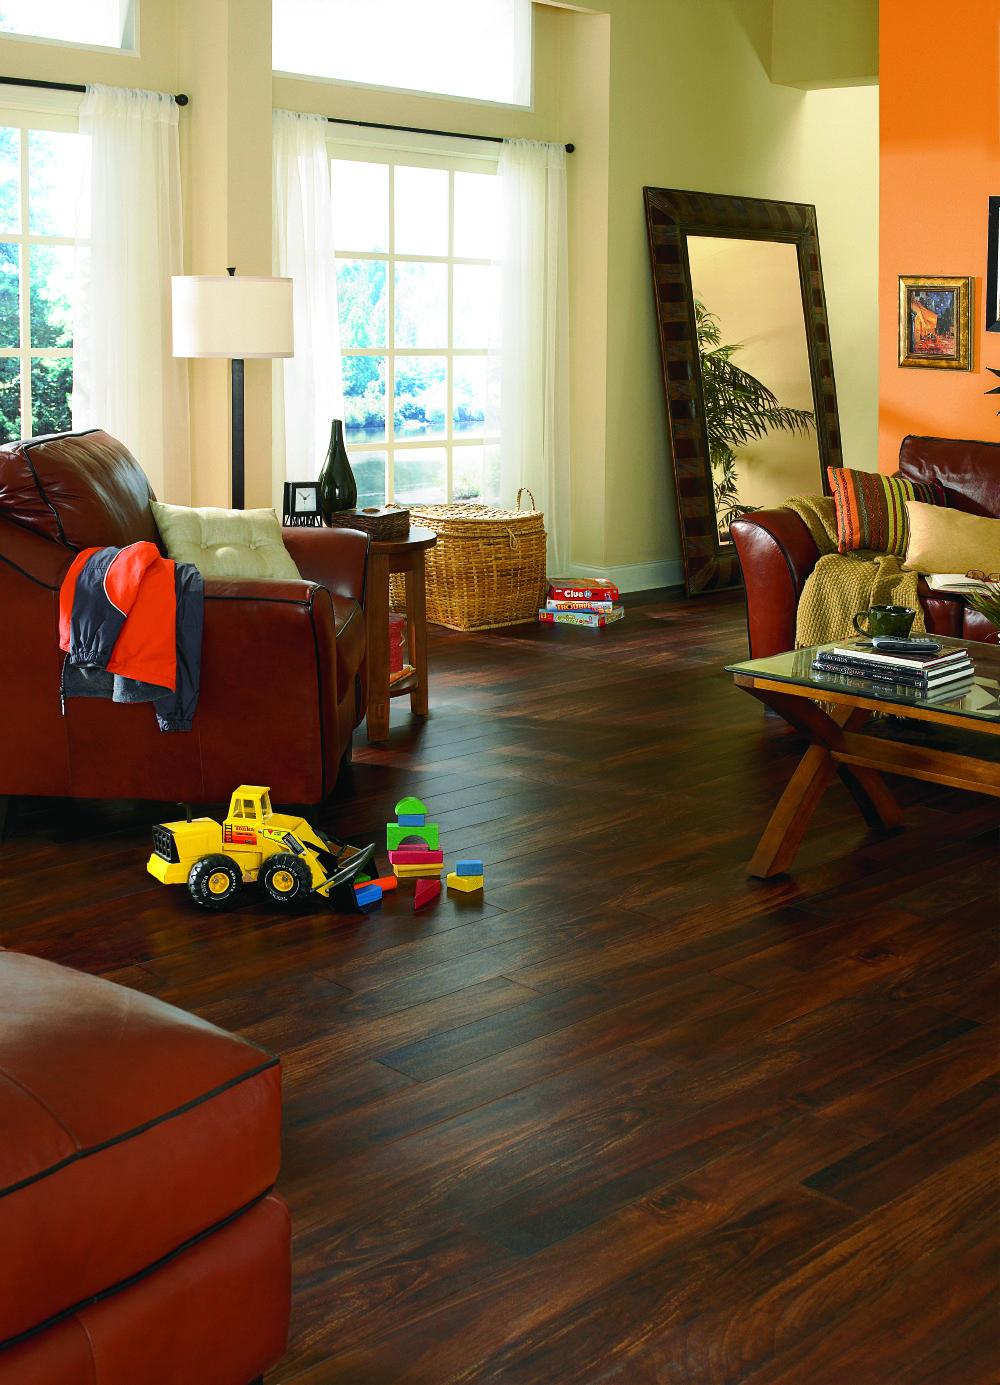 How To Calculate Price Per Square Foot For Flooring In 2020 Refinishing Hardwood Floors Best Wood Flooring Wood Floor Colors